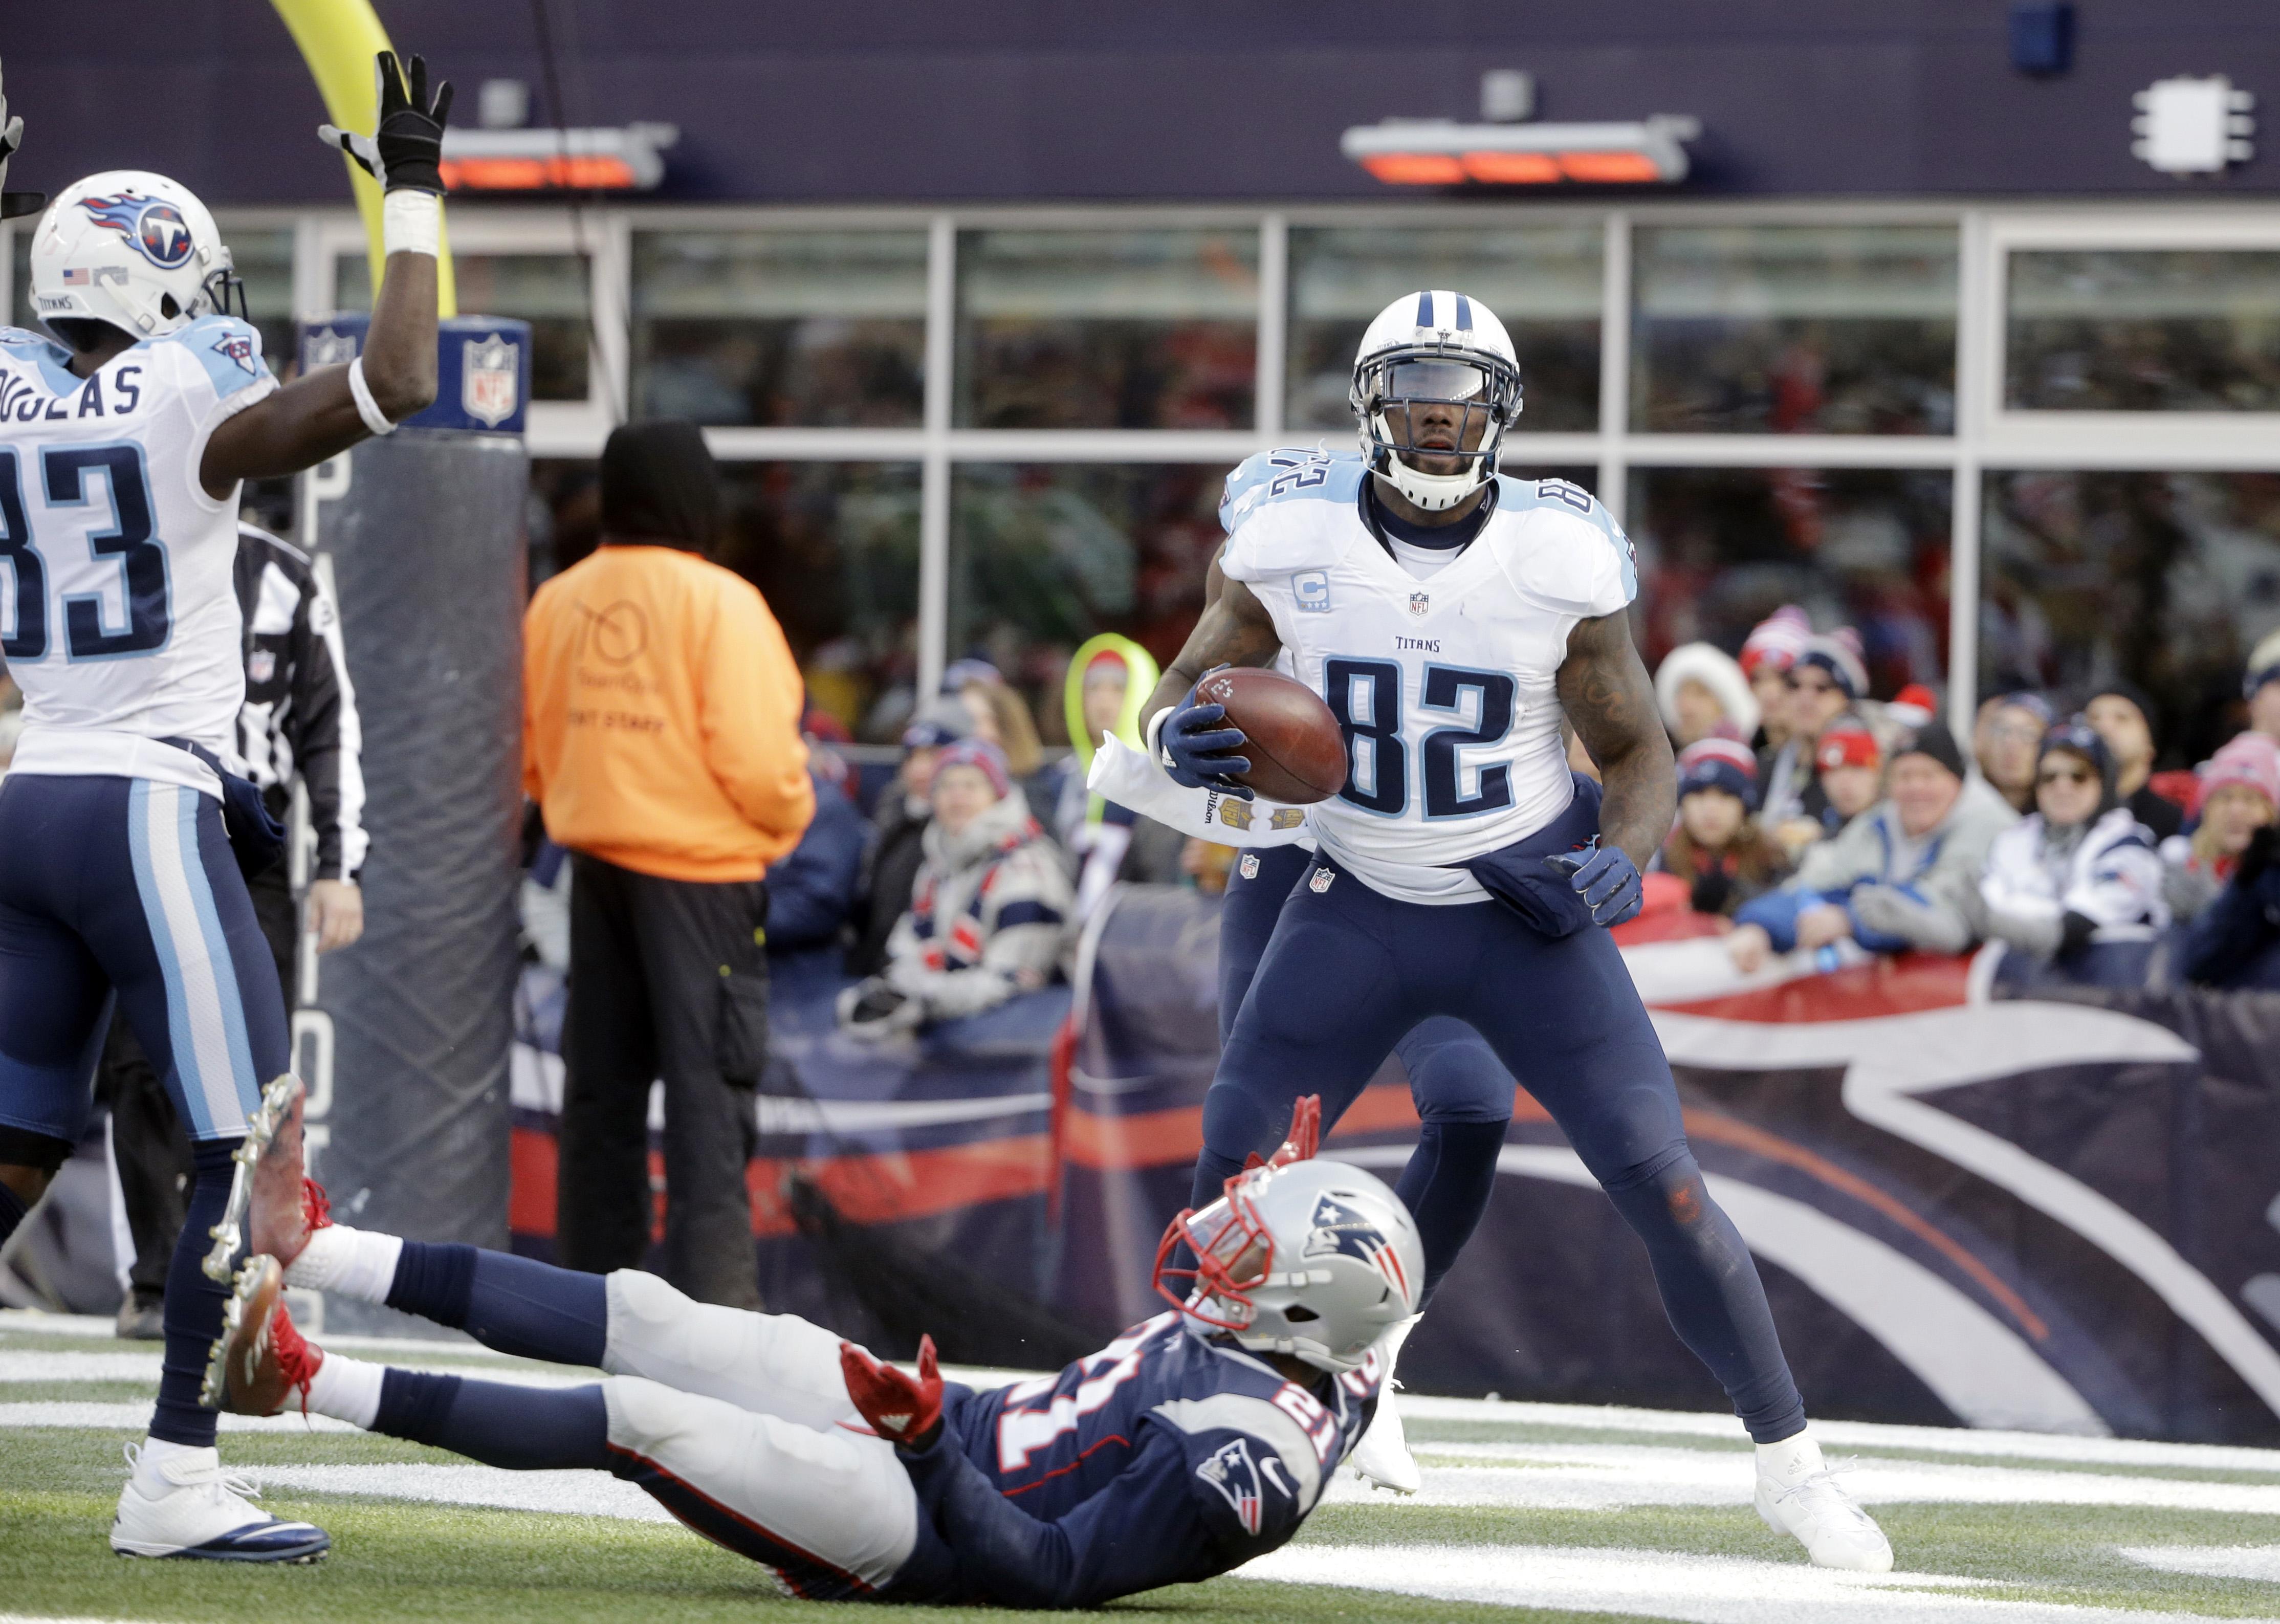 Video Delanie Walker scores 57 yard TD against Patriots